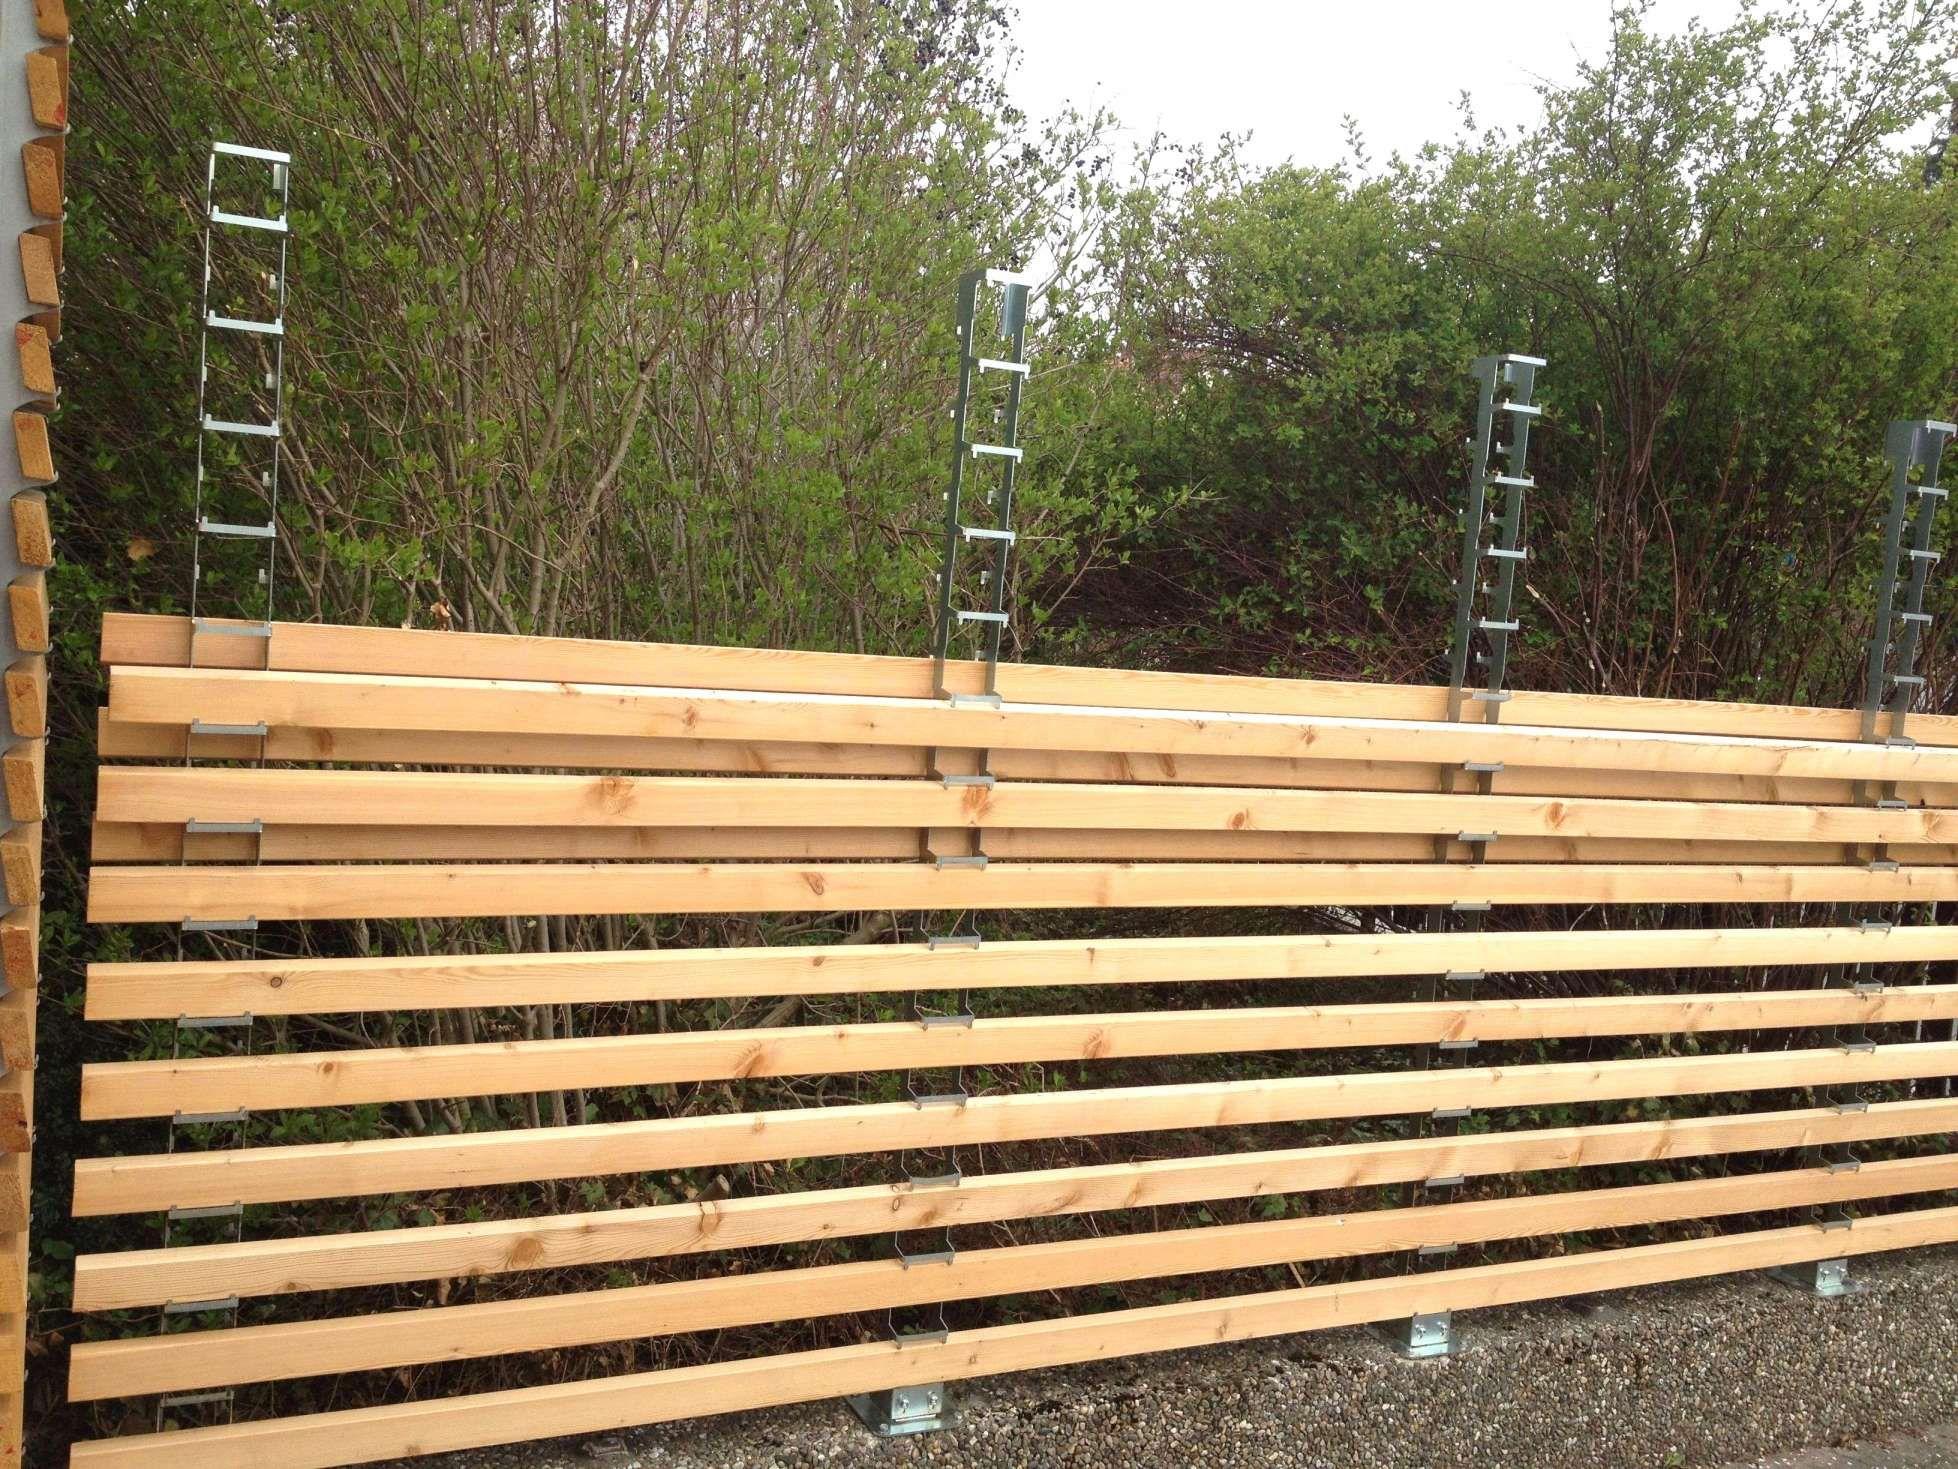 12 Zaun Selber Bauen Garten Gestaltung Gartengestaltung